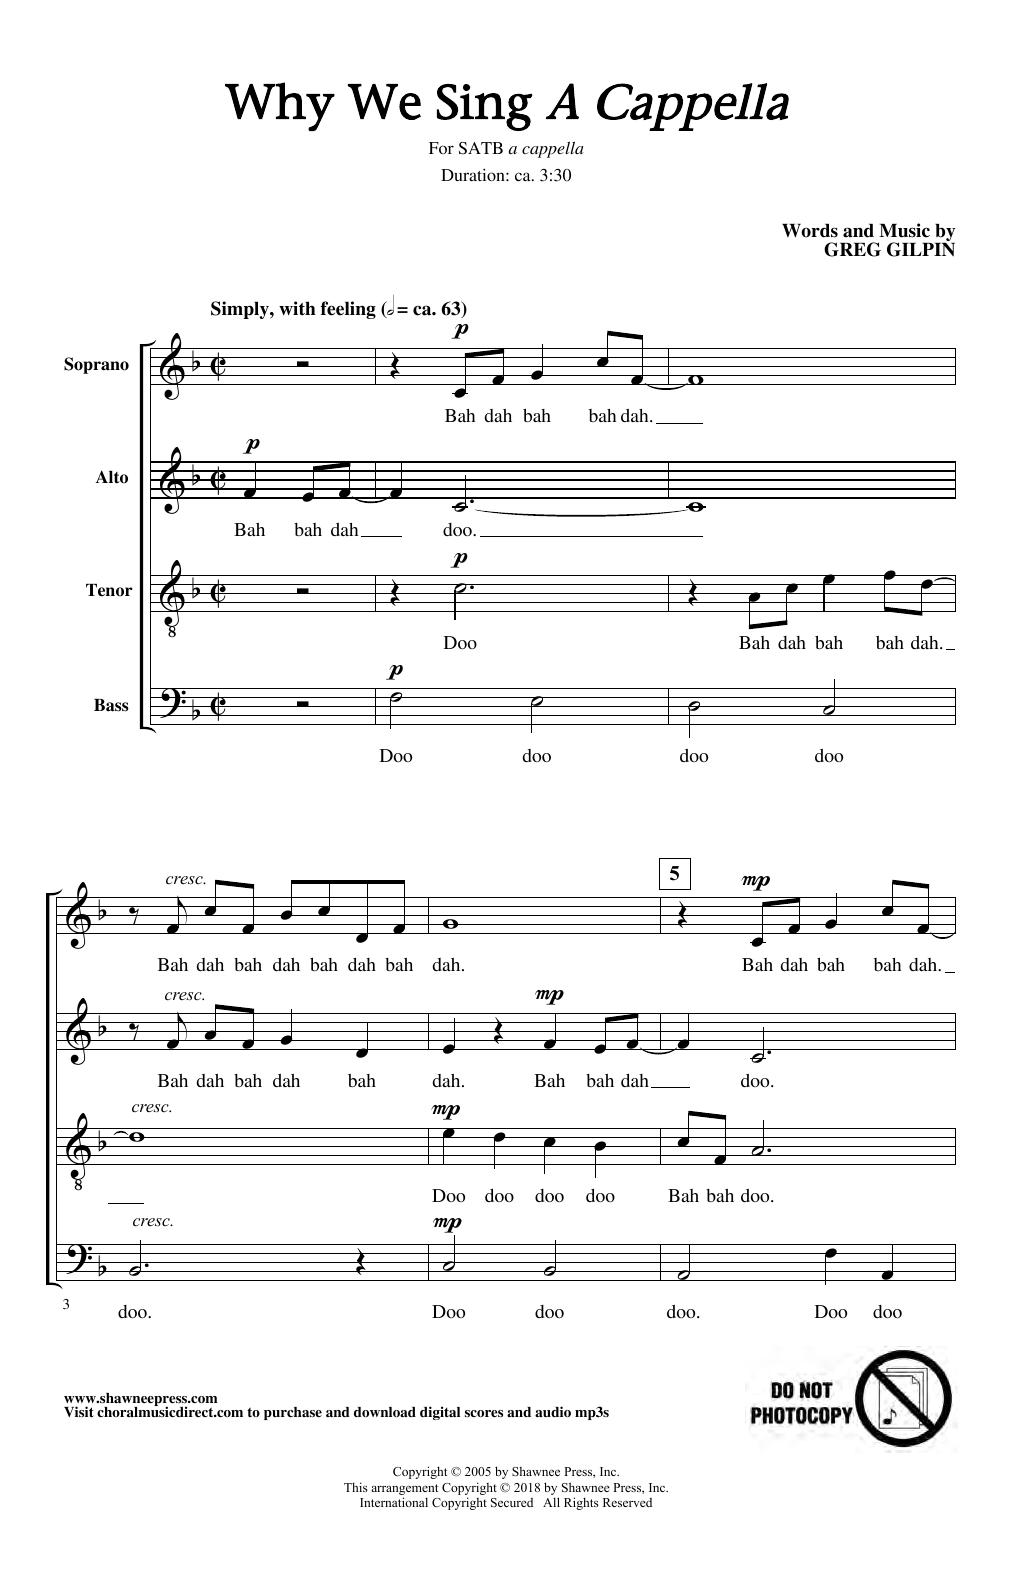 Greg Gilpin Why We Sing sheet music notes and chords. Download Printable PDF.